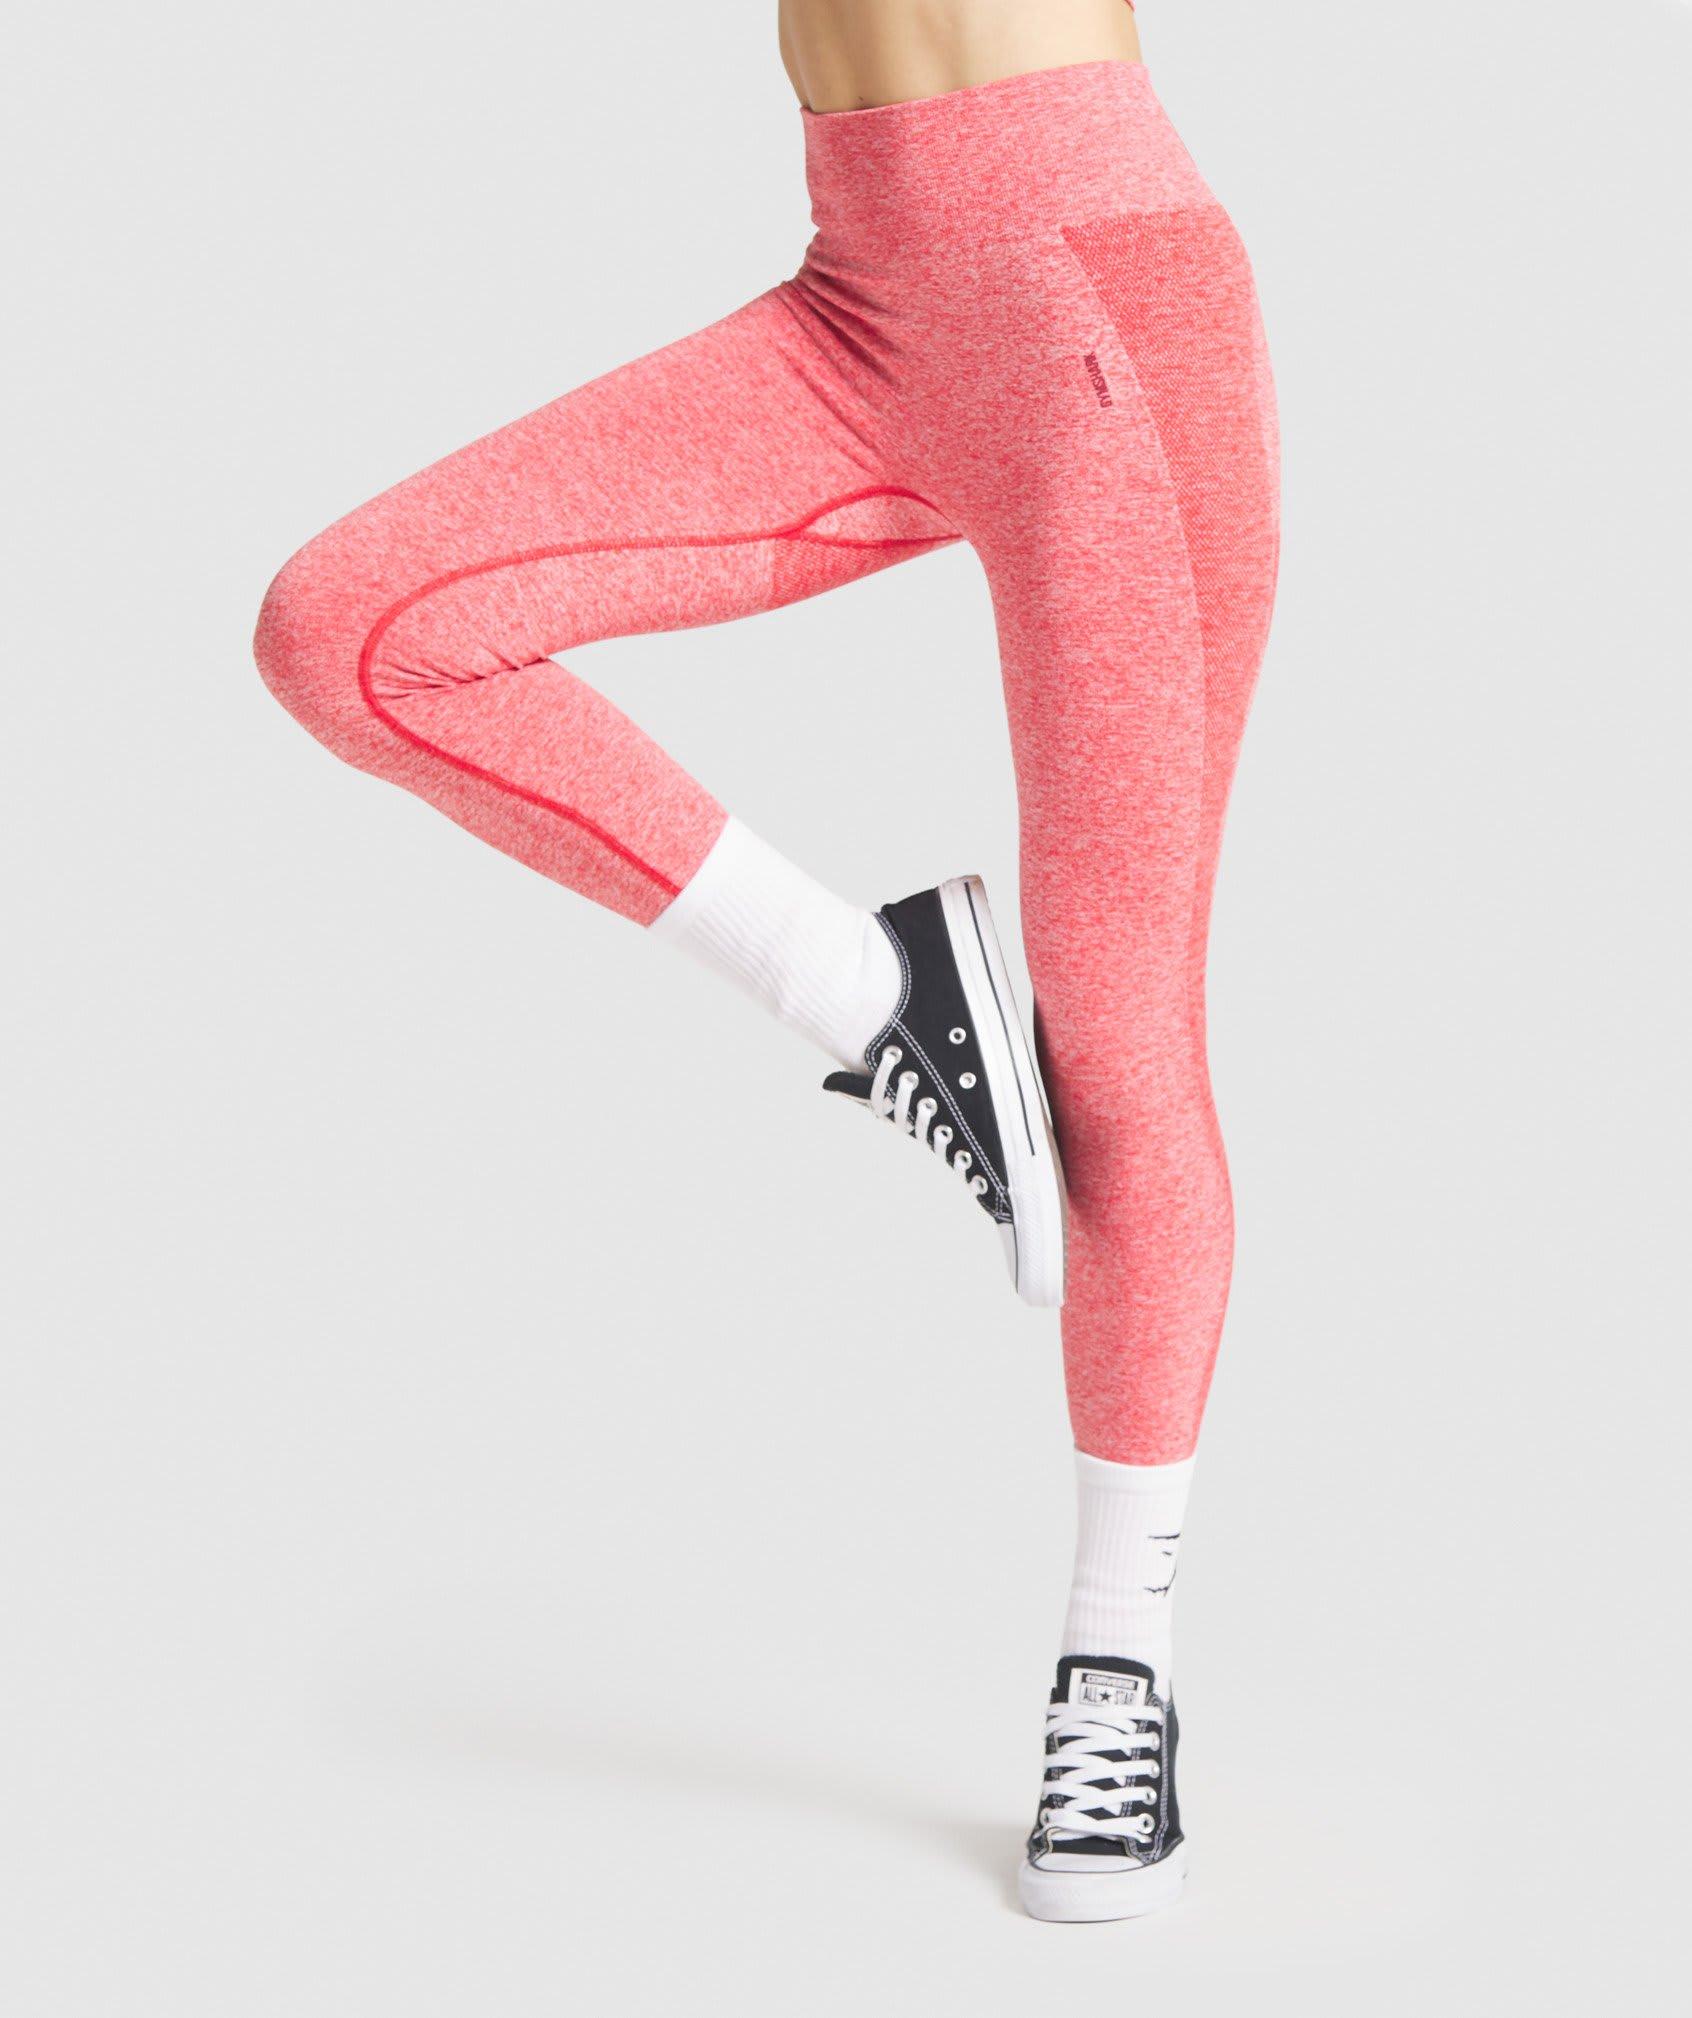 FLEX HIGH WAISTED LEGGINGS by GYMSHARK, available on gymshark.com for $50 Nicole Scherzinger Pants SIMILAR PRODUCT